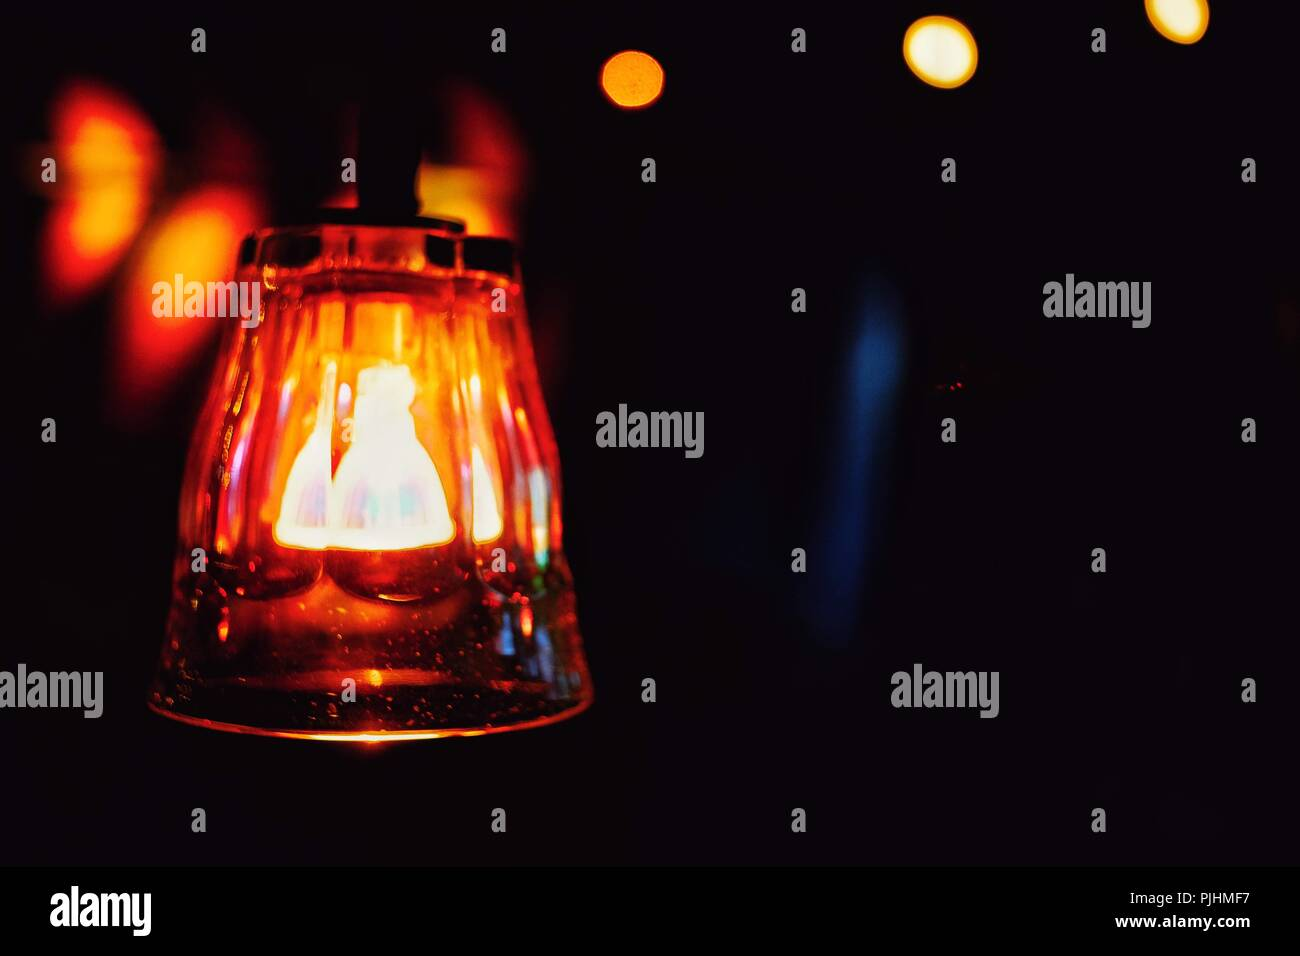 glass light - Stock Image